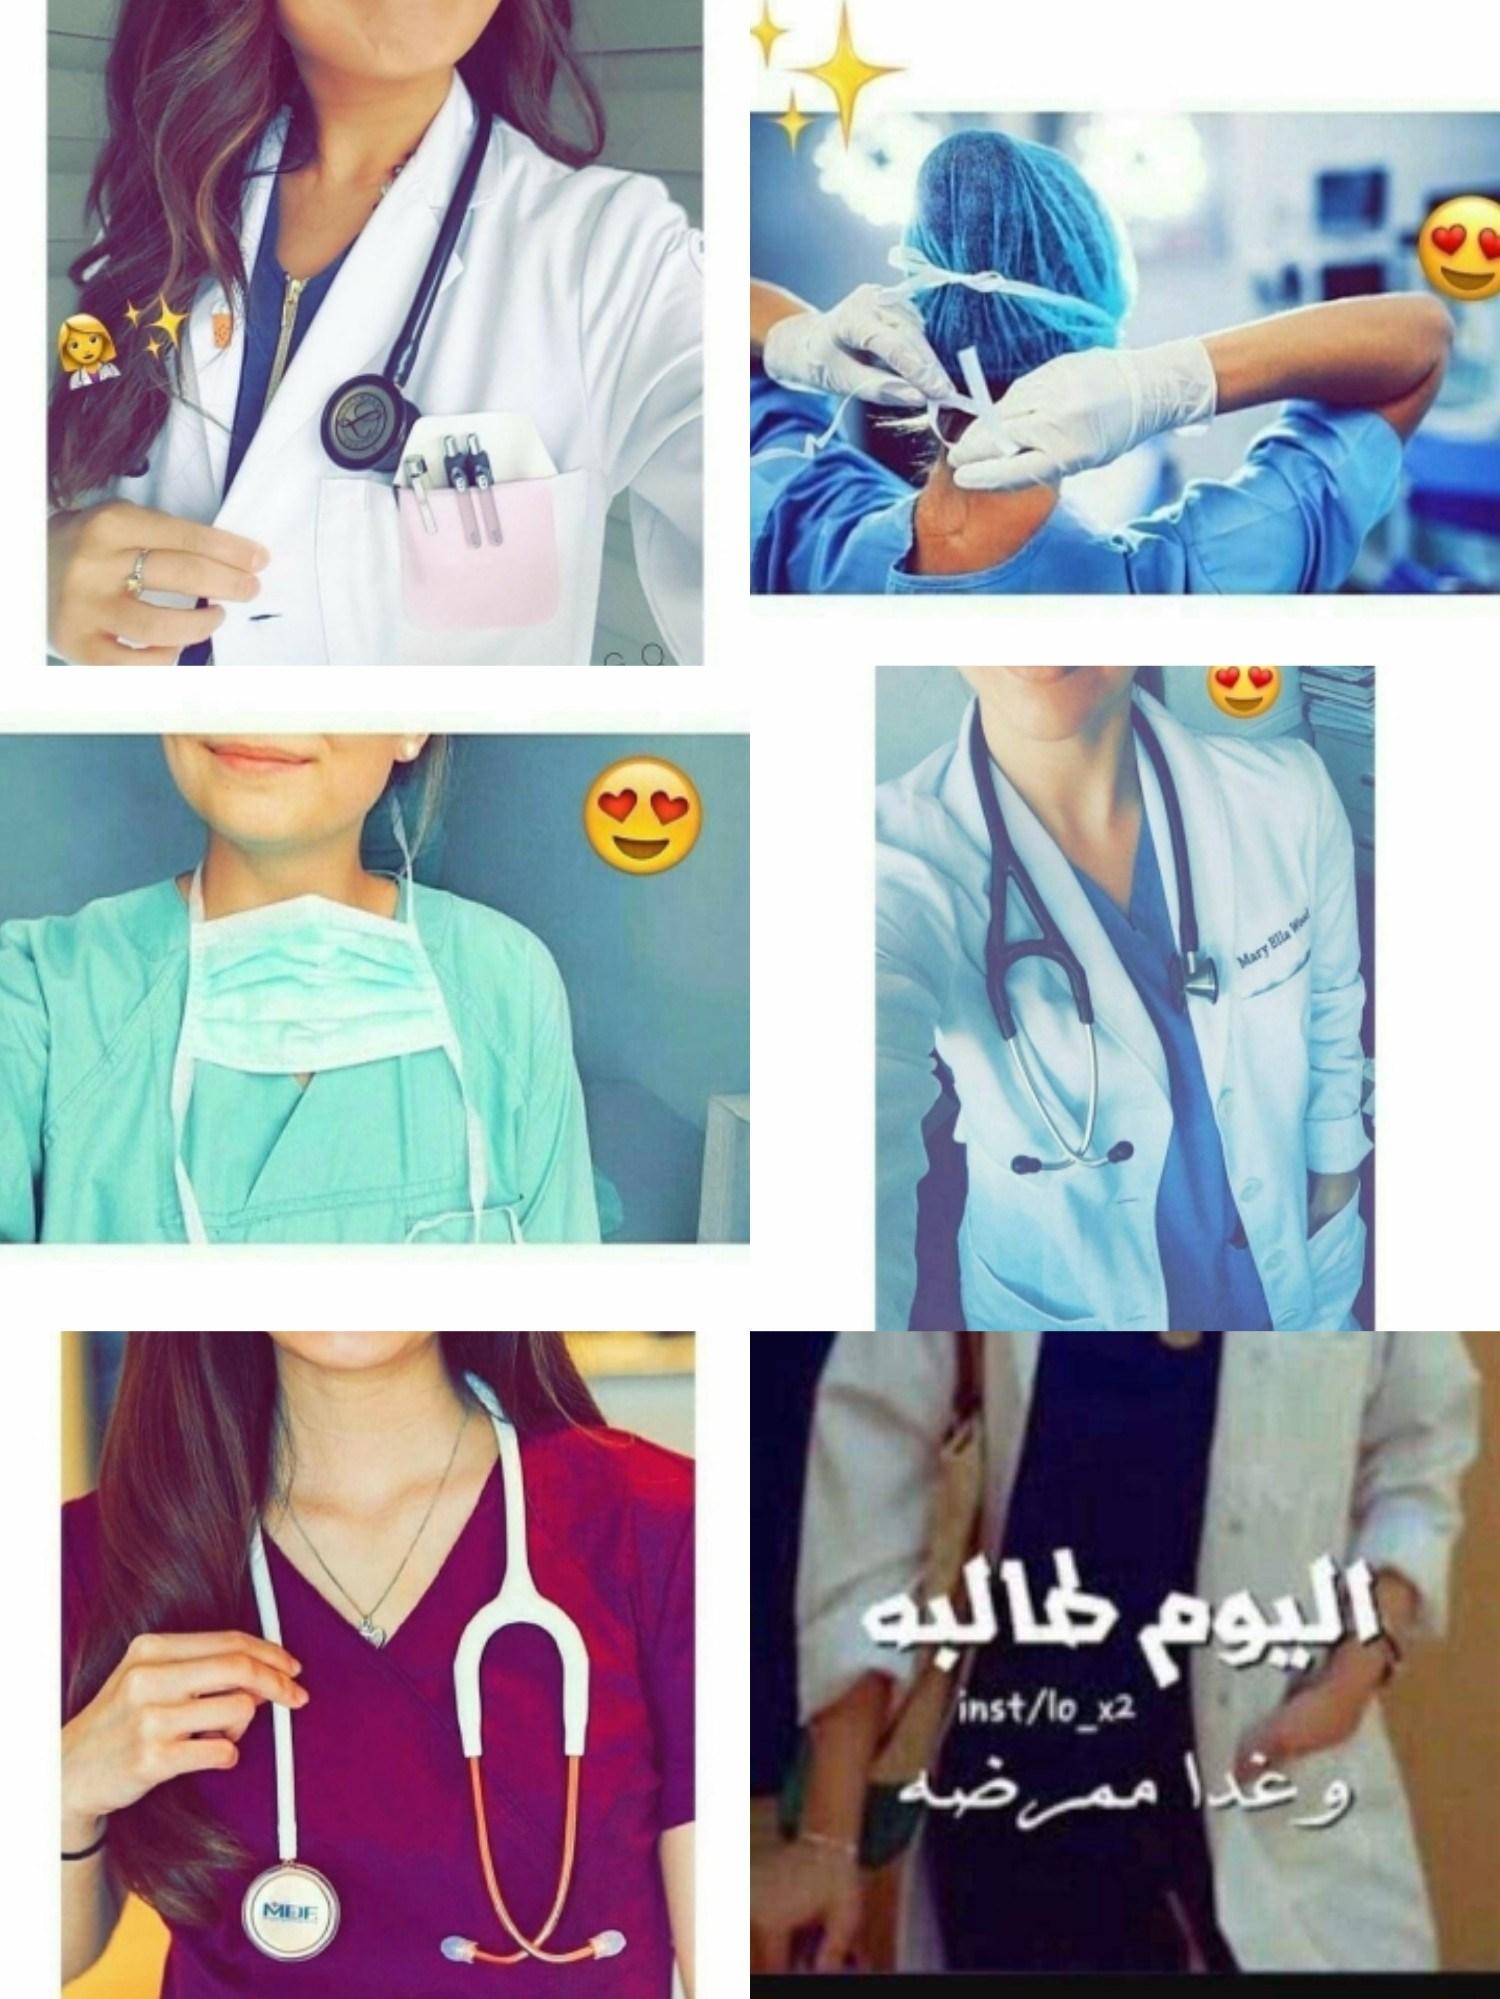 hala_mahdii's Cover Photo